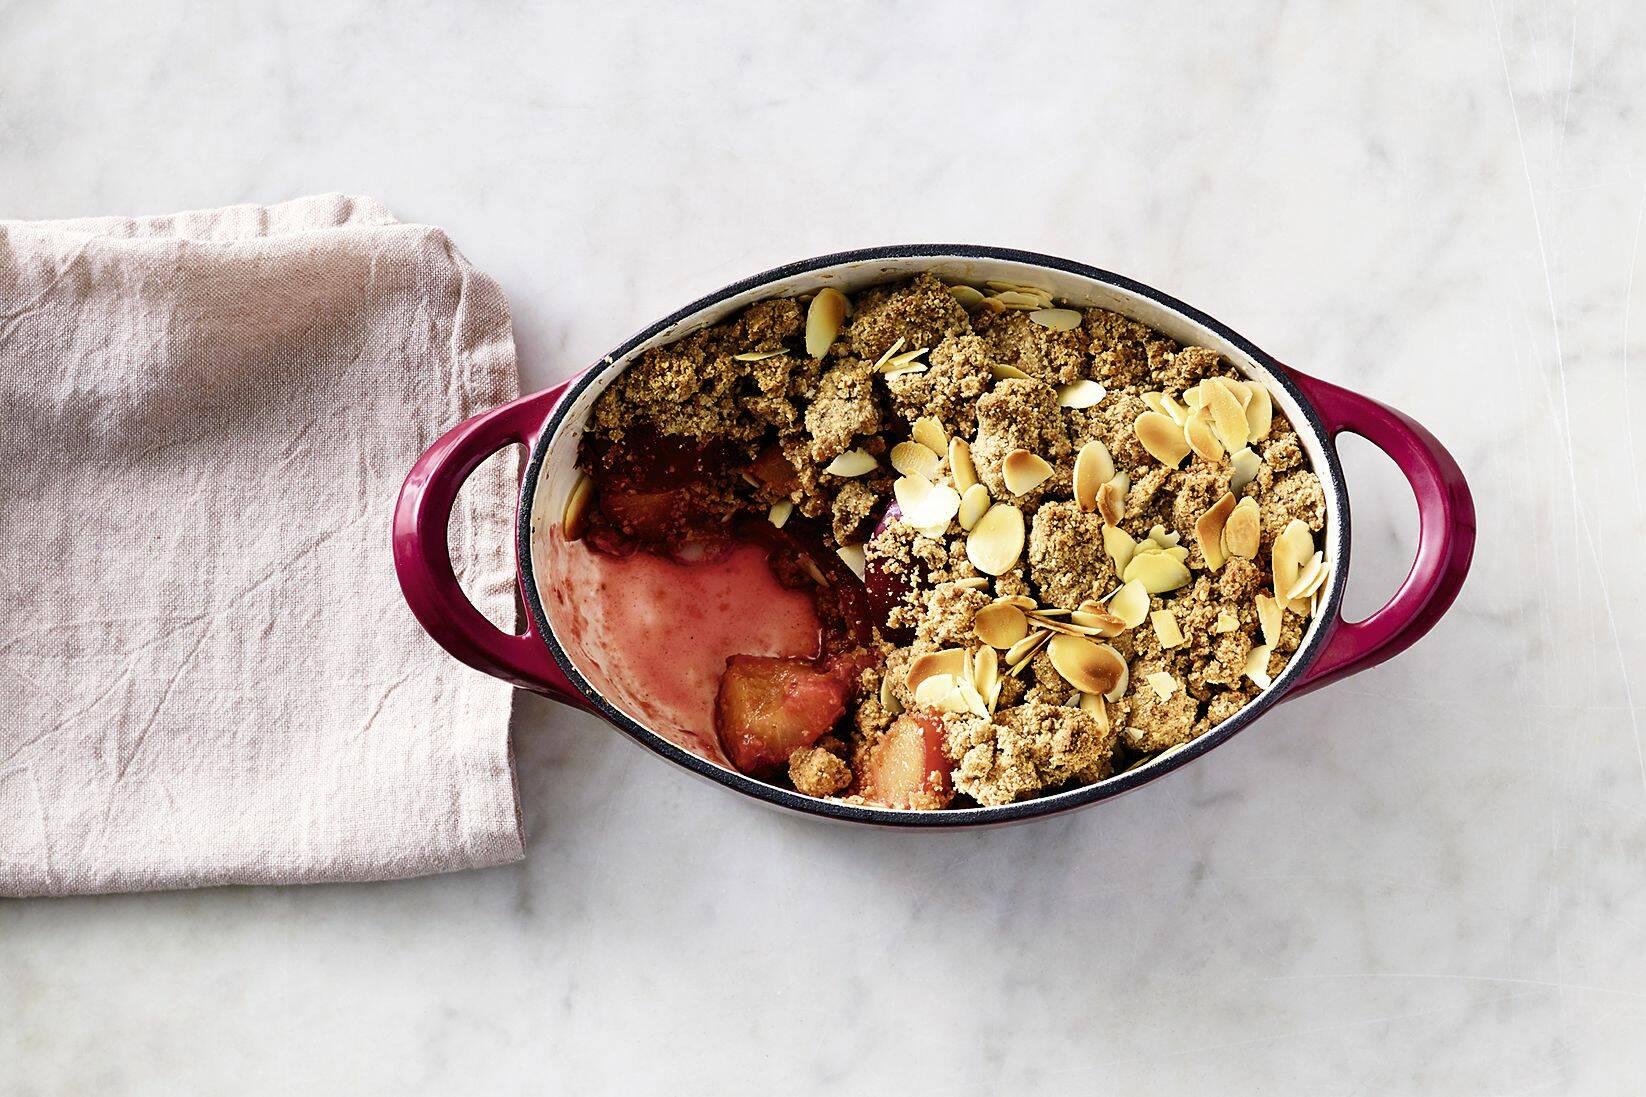 pflaumen crumble mit mandeln rezept küchengötter